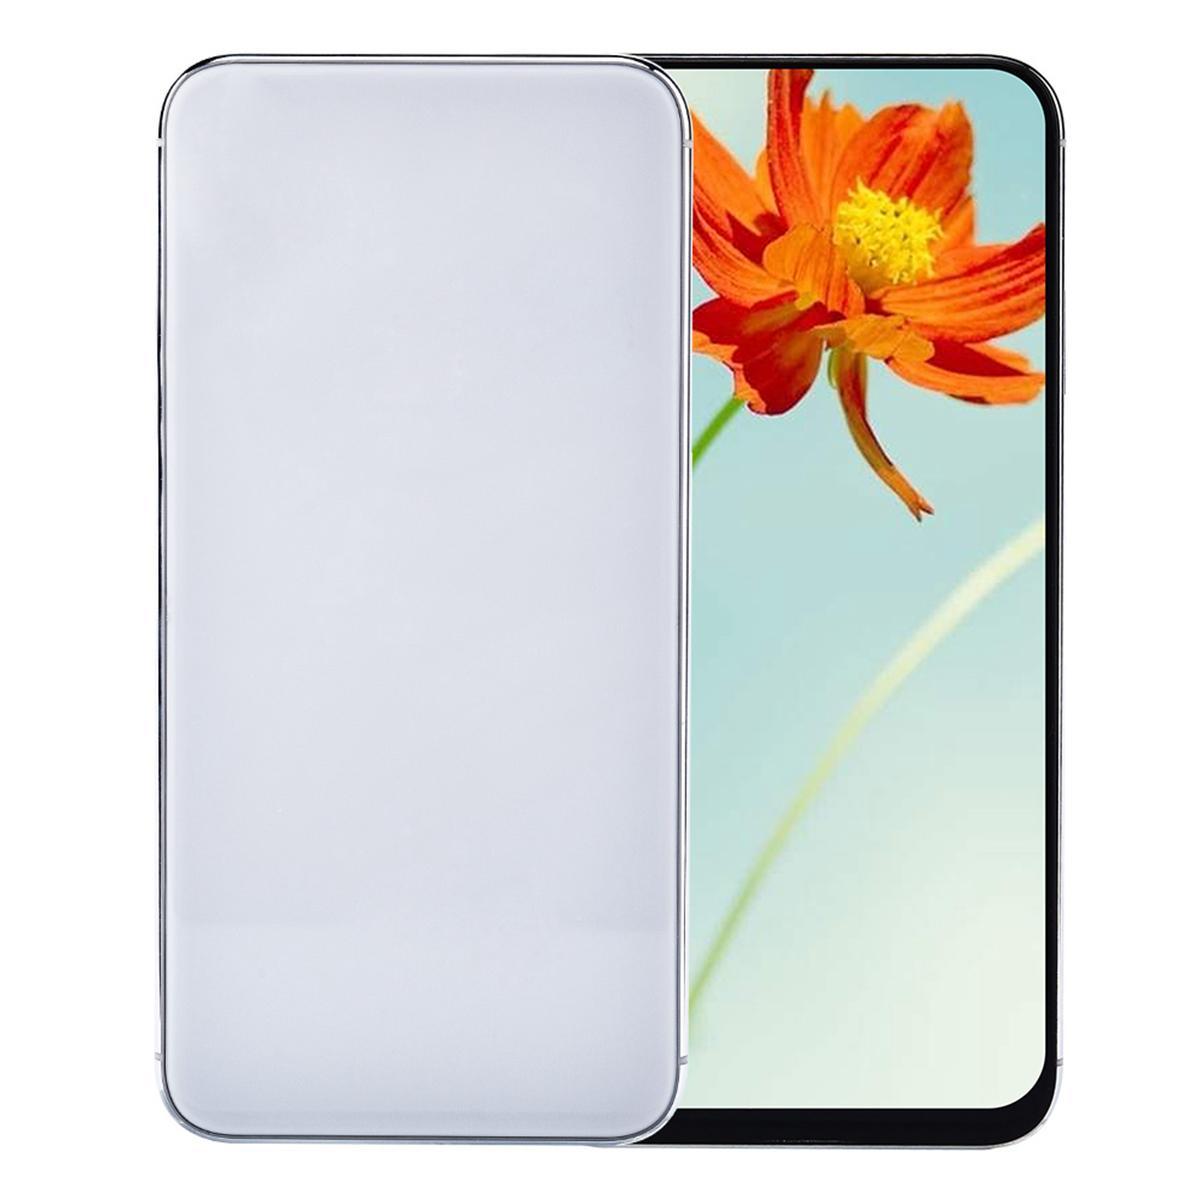 Billig 3G WCDMA GOOPHONE I12 PRO MAX 5G V2 QAUD CORE MTK6580 1 GB 4 GB Android 10 6,7 Zoll Alle Bildschirm HD + FACE ID WLAN-Ladung Smartphone